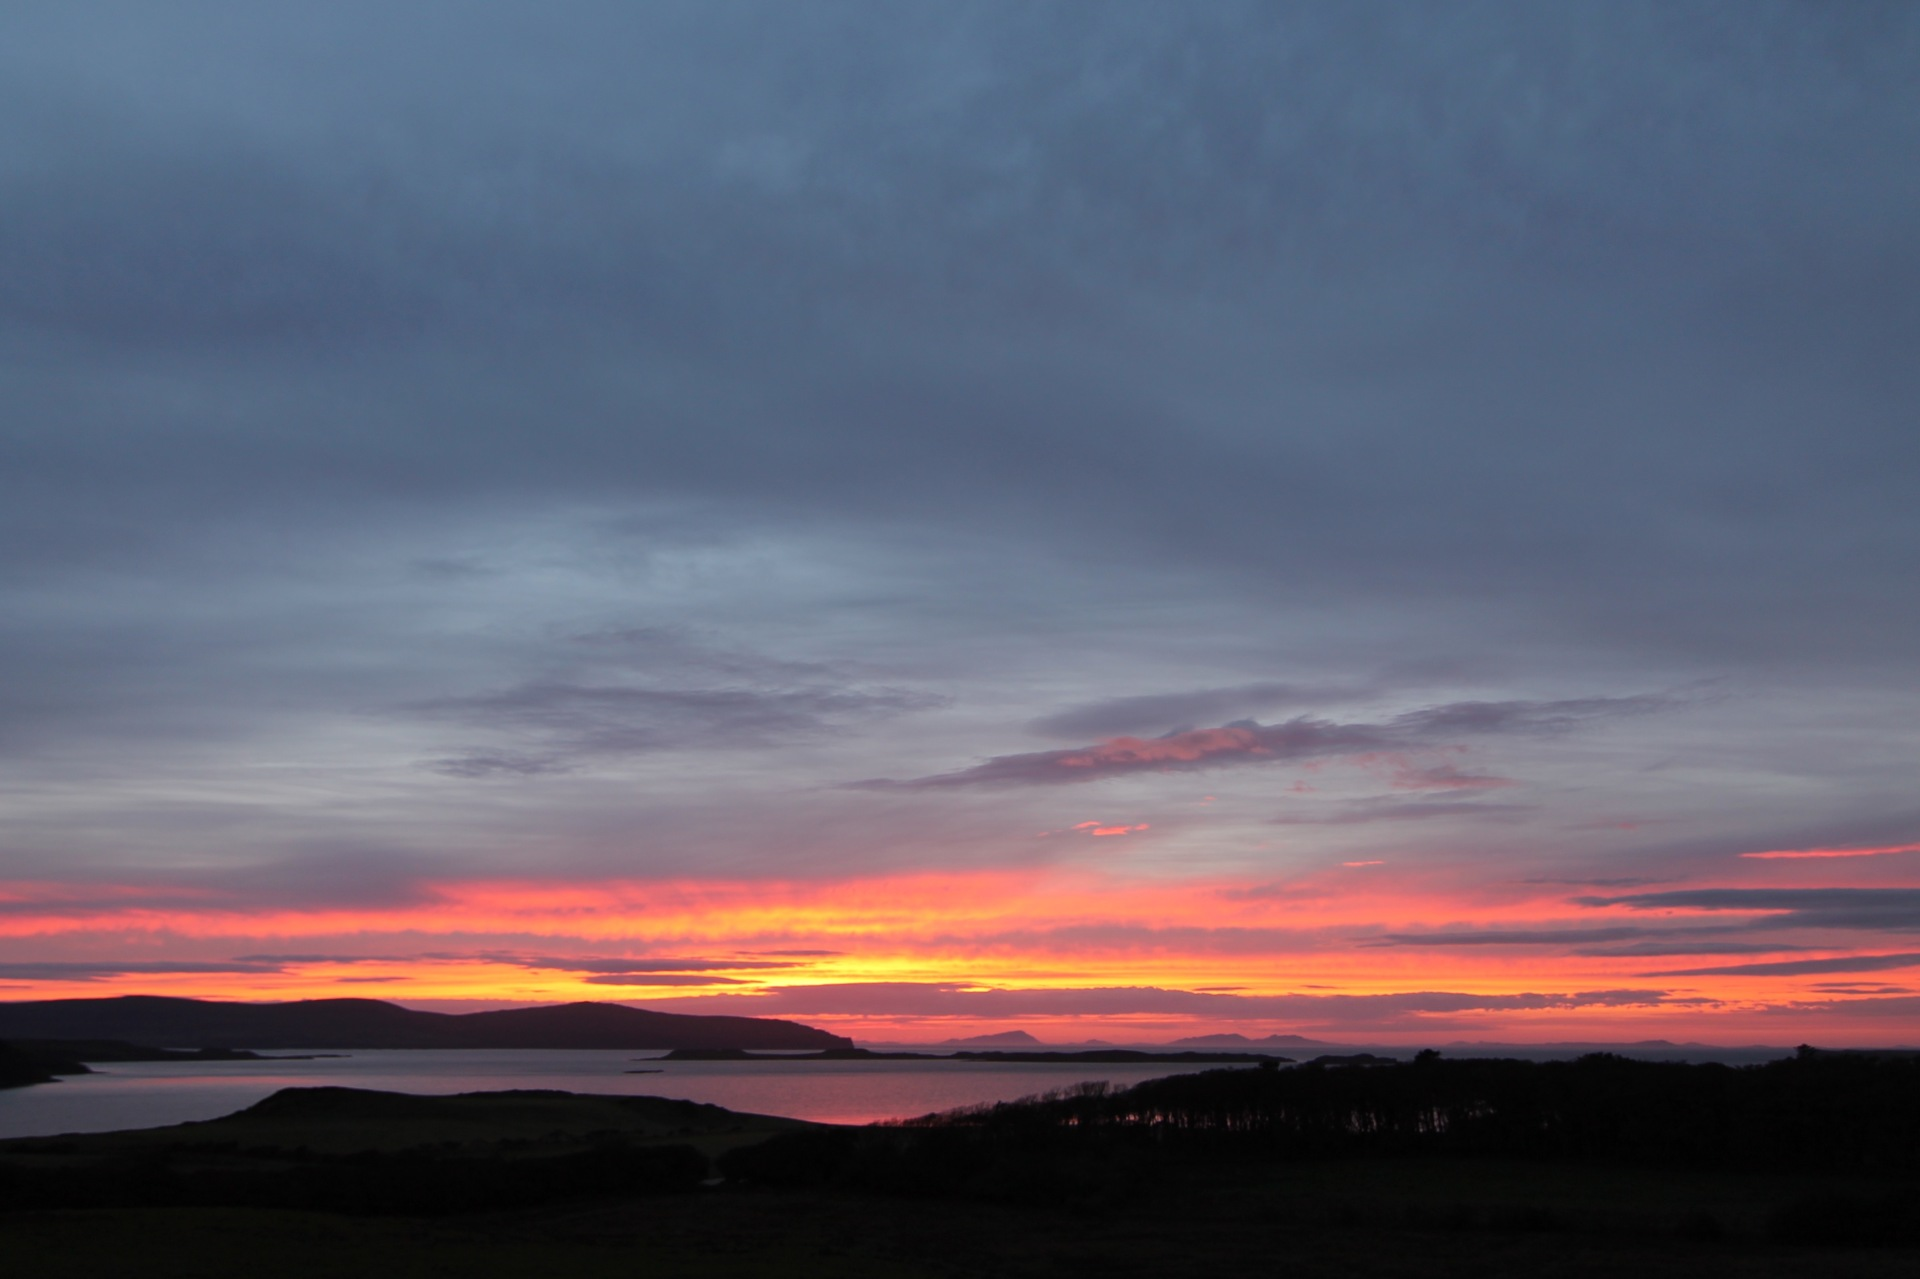 Stunning sunset over Loch Bay